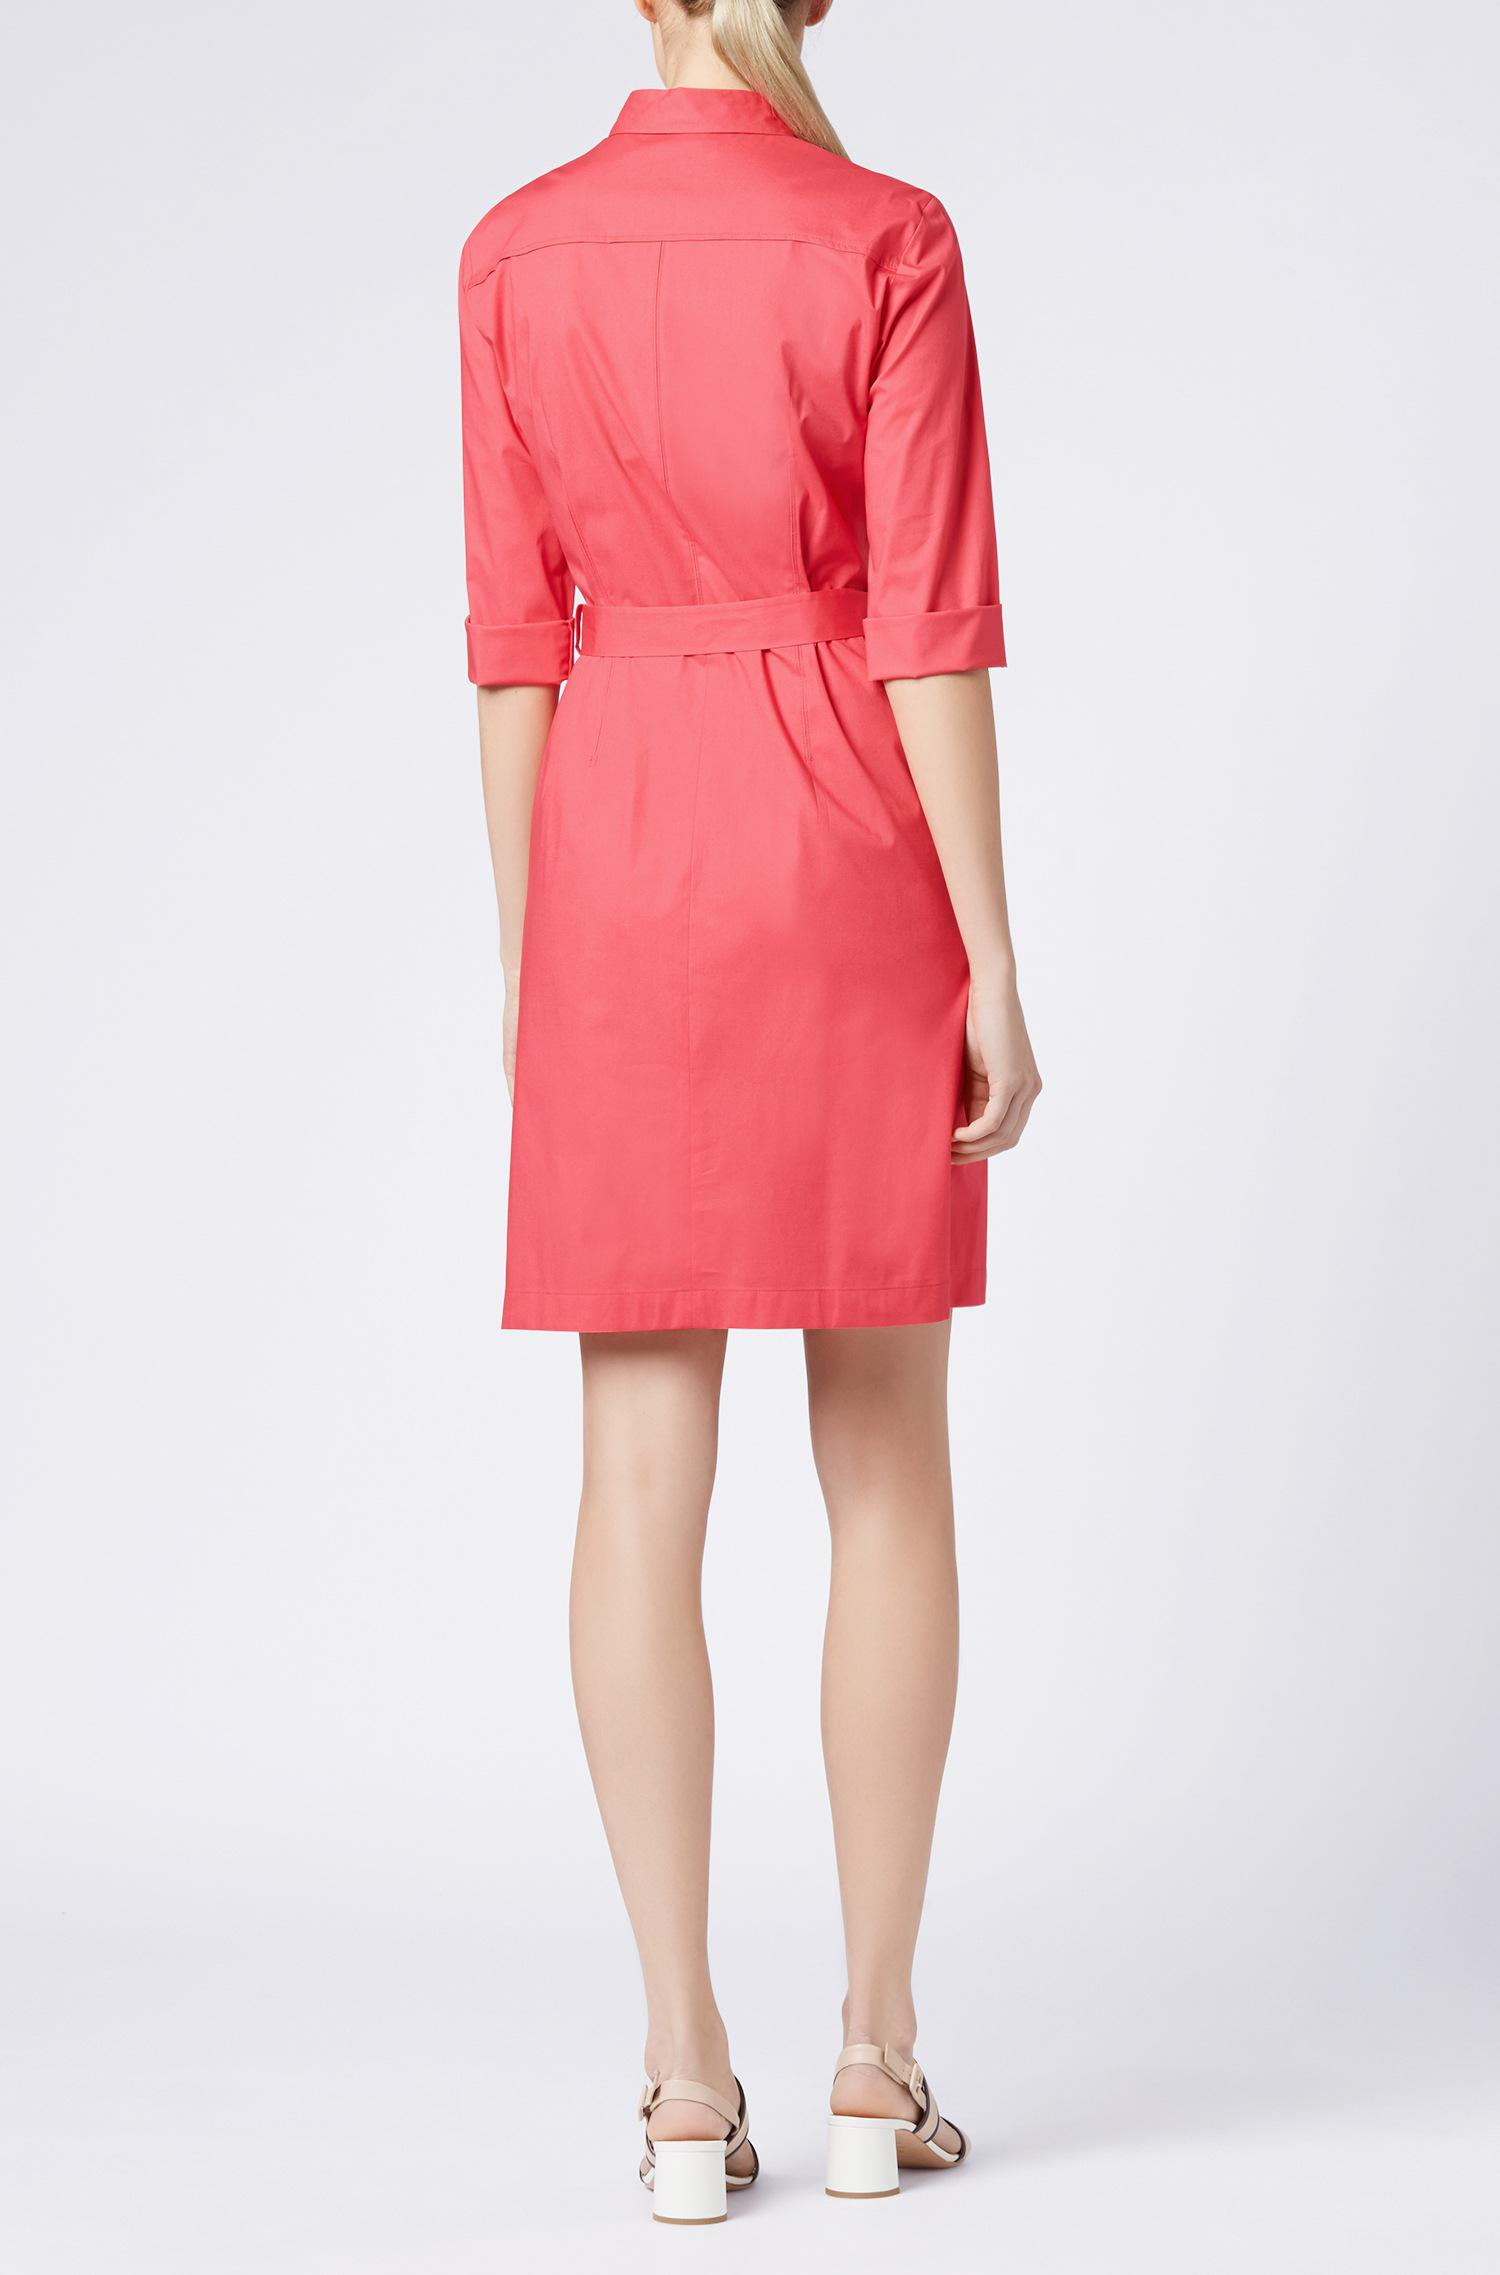 0dd51aff5 BOSS Stretch Cotton Belted Shirtdress | Dashiri in Pink - Lyst